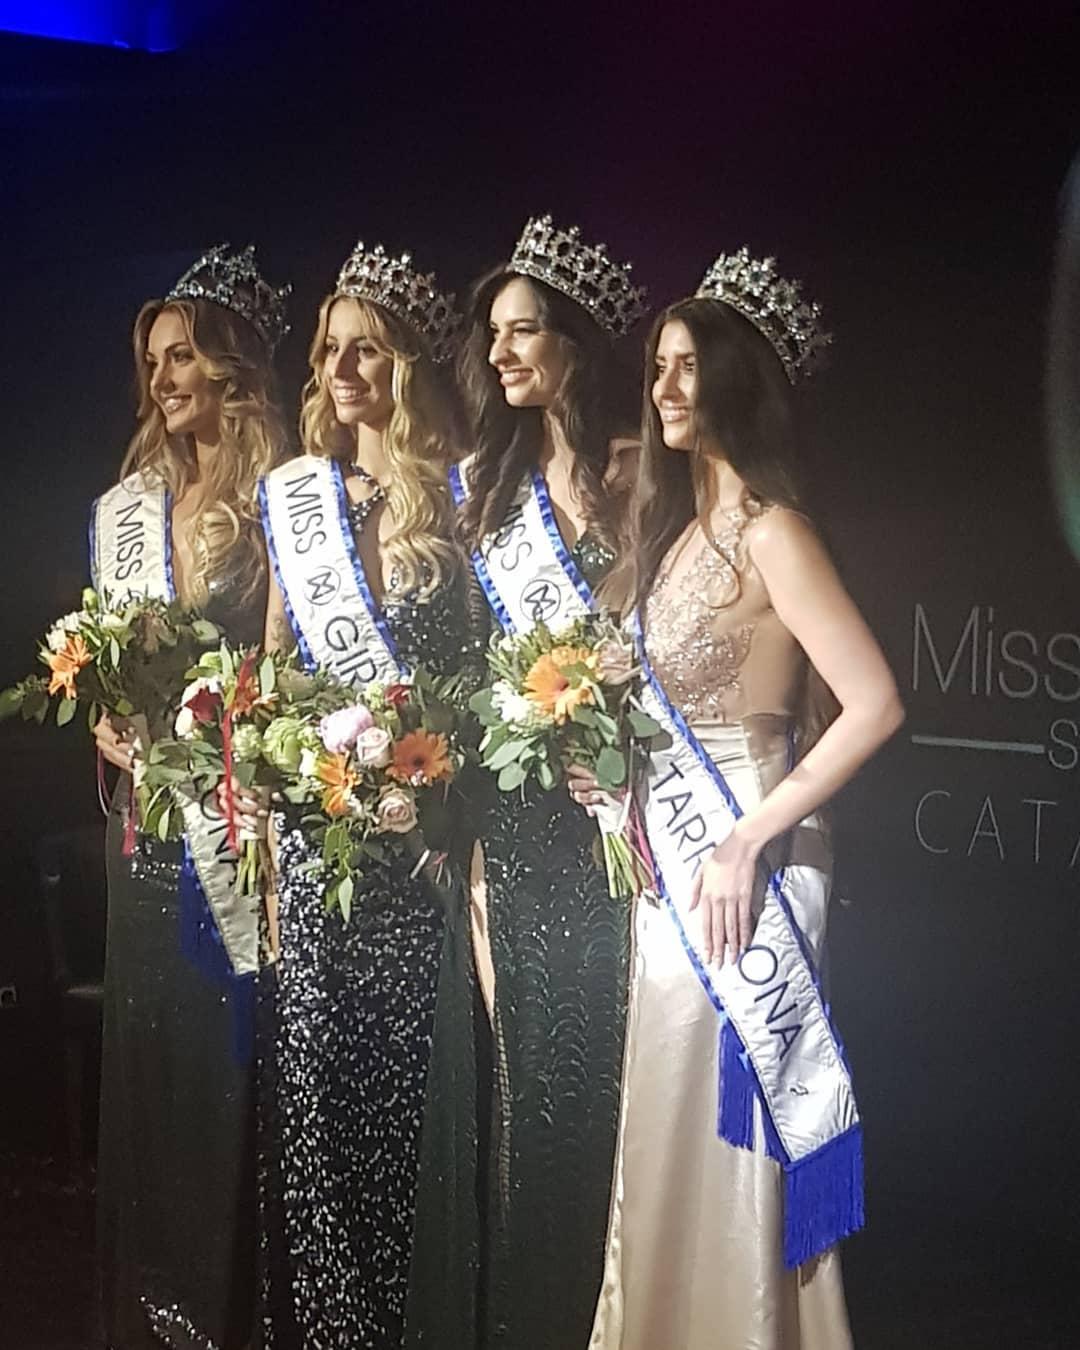 miss world spain 2020, vencedora: almeria. - Página 5 Jesus-abelenda-barcelona-107104954-1836793566463760-9105940352777564275-n